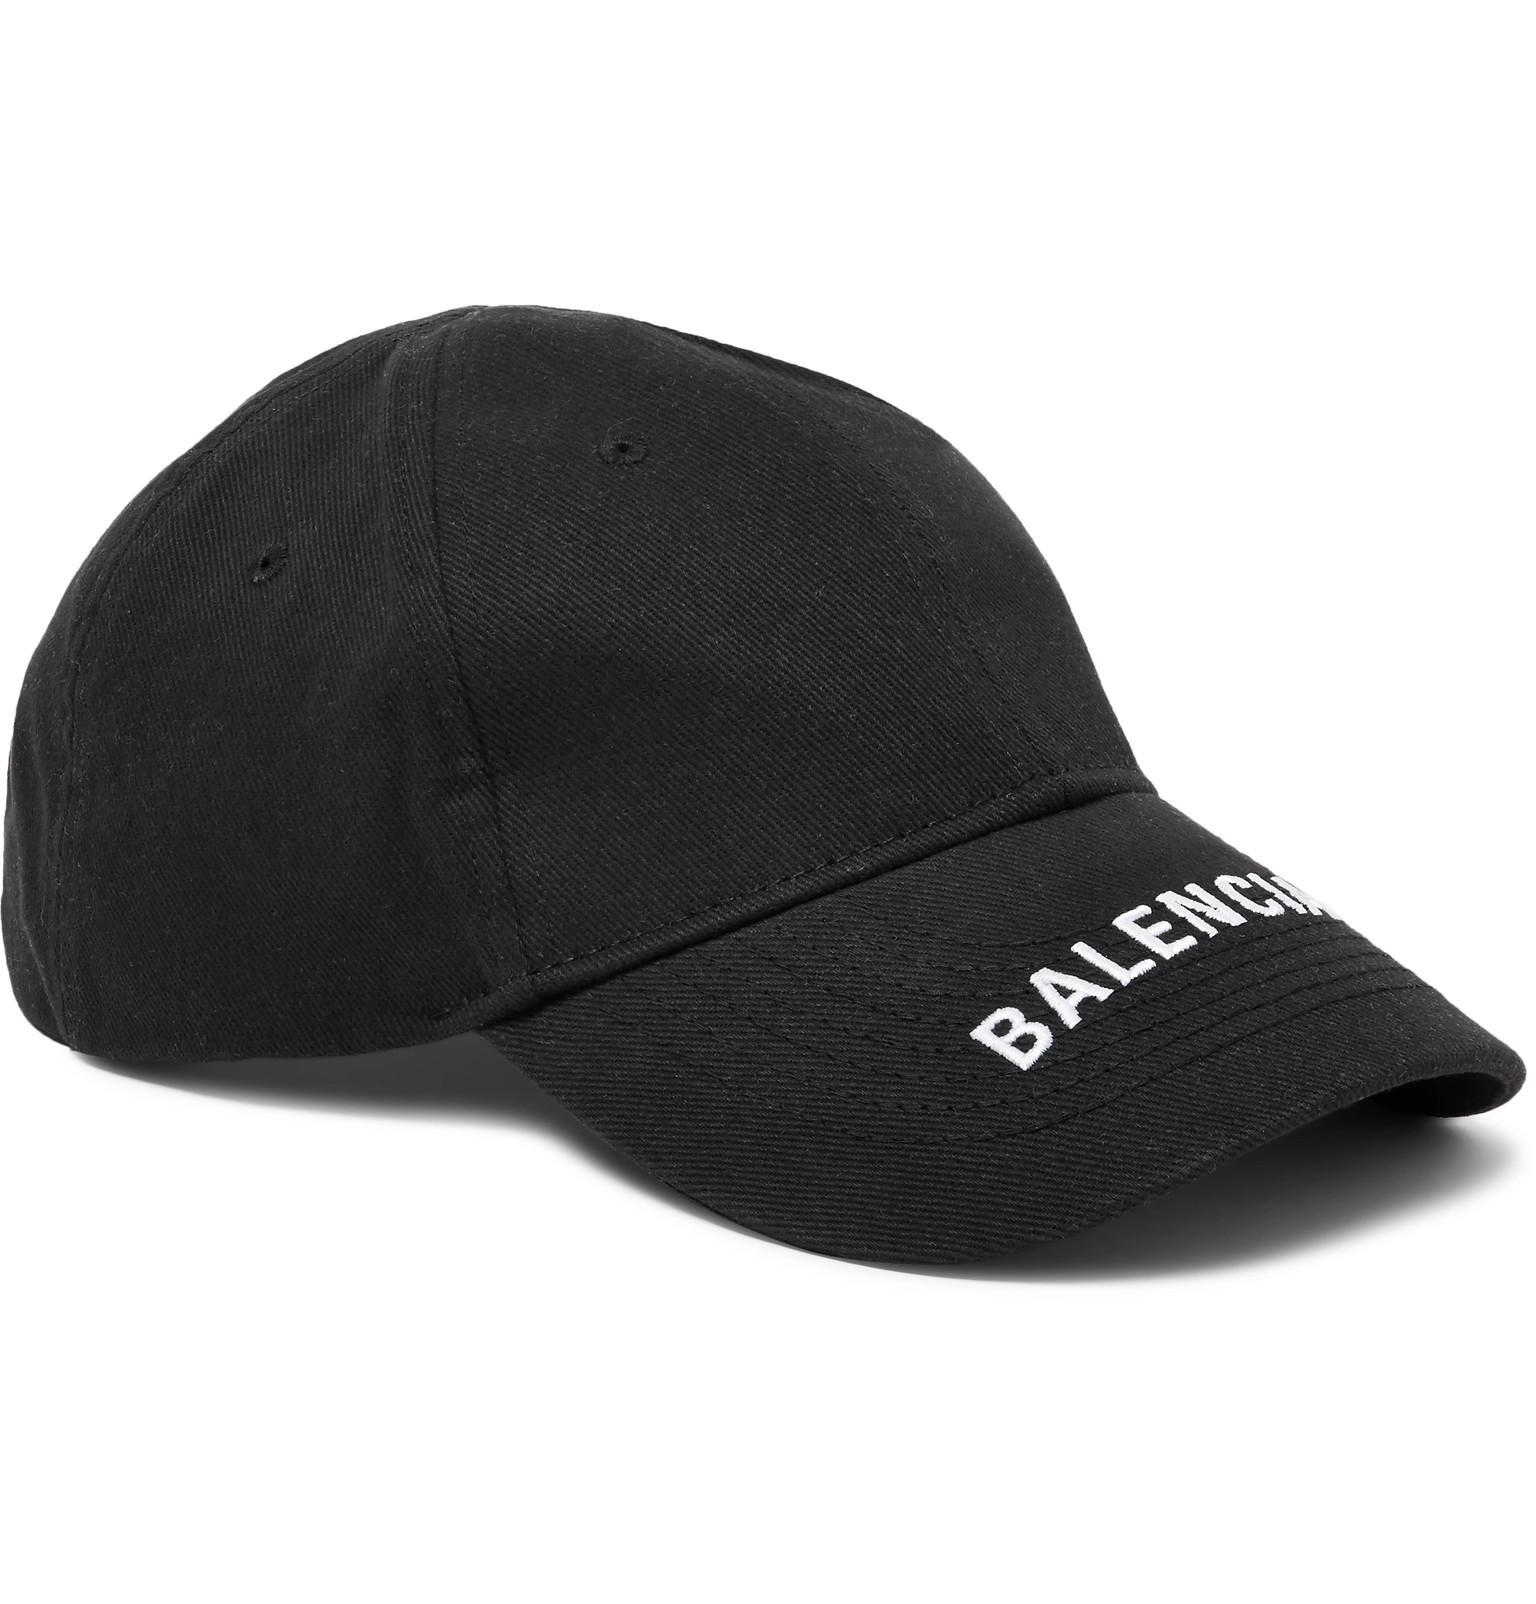 6a4af087d76f7 Lyst - Balenciaga Logo-embroidered Cotton-twill Baseball Cap in ...